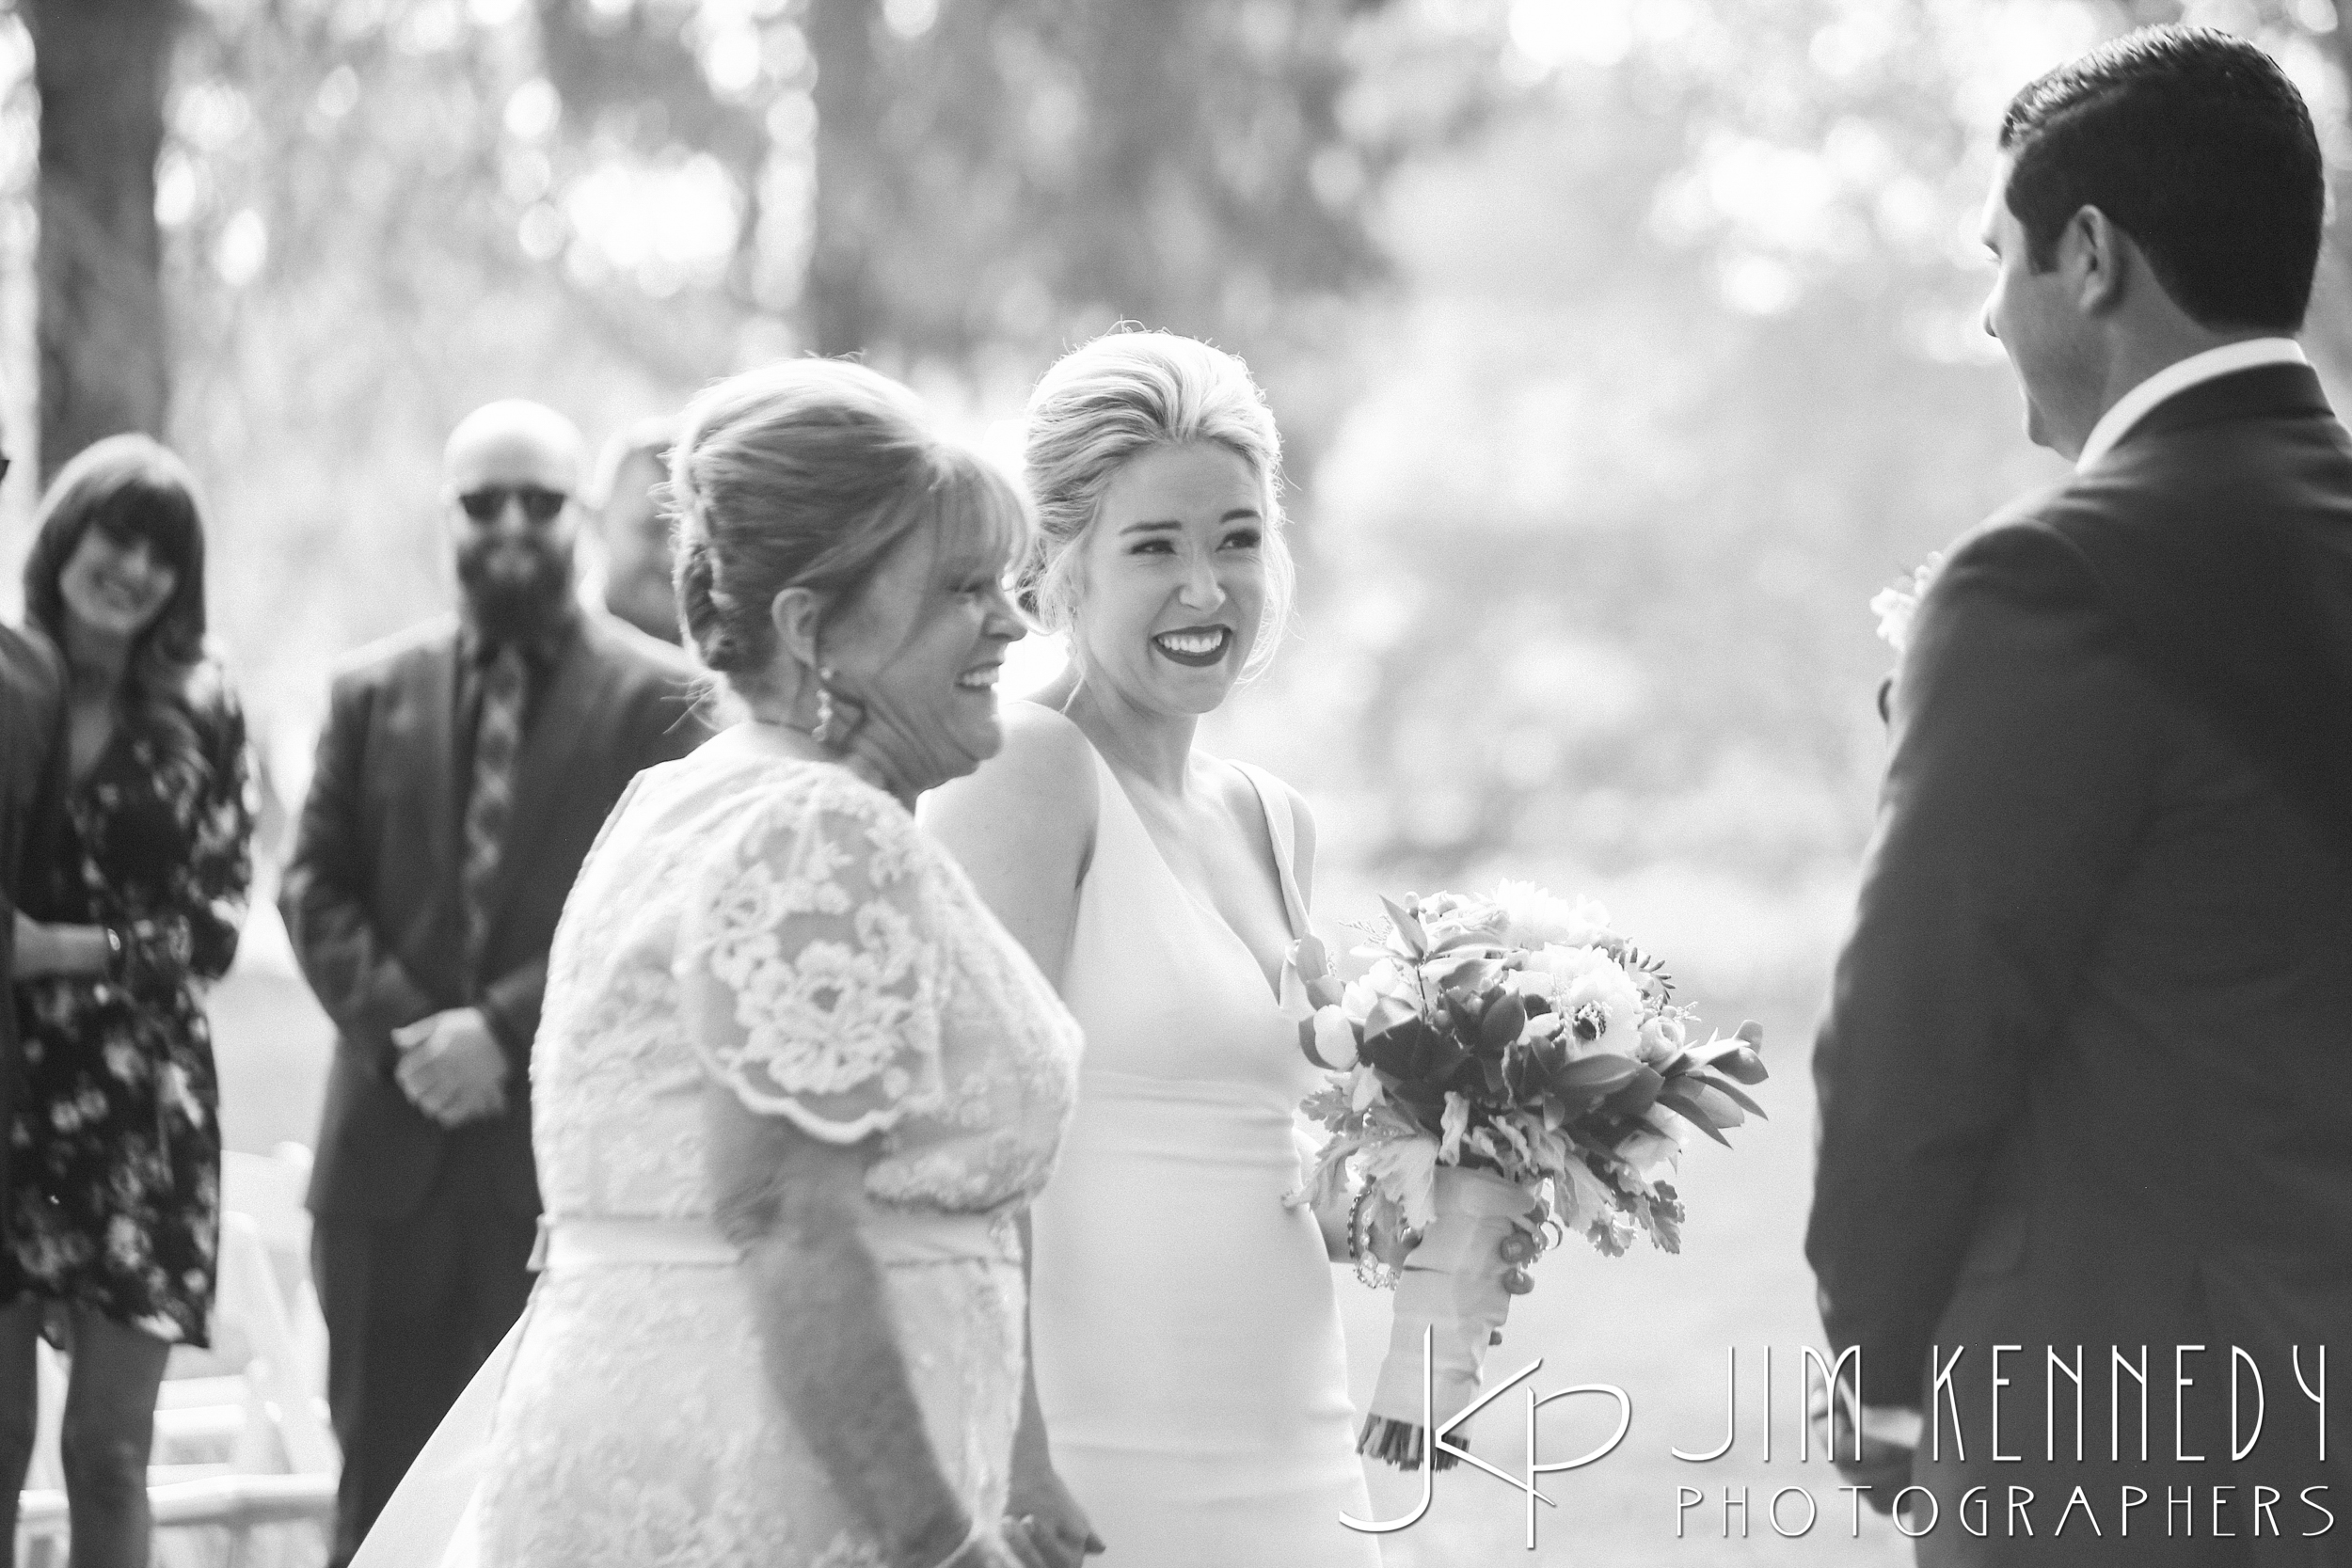 jim_kennedy_photographers_highland_springs_wedding_caitlyn_0080.jpg